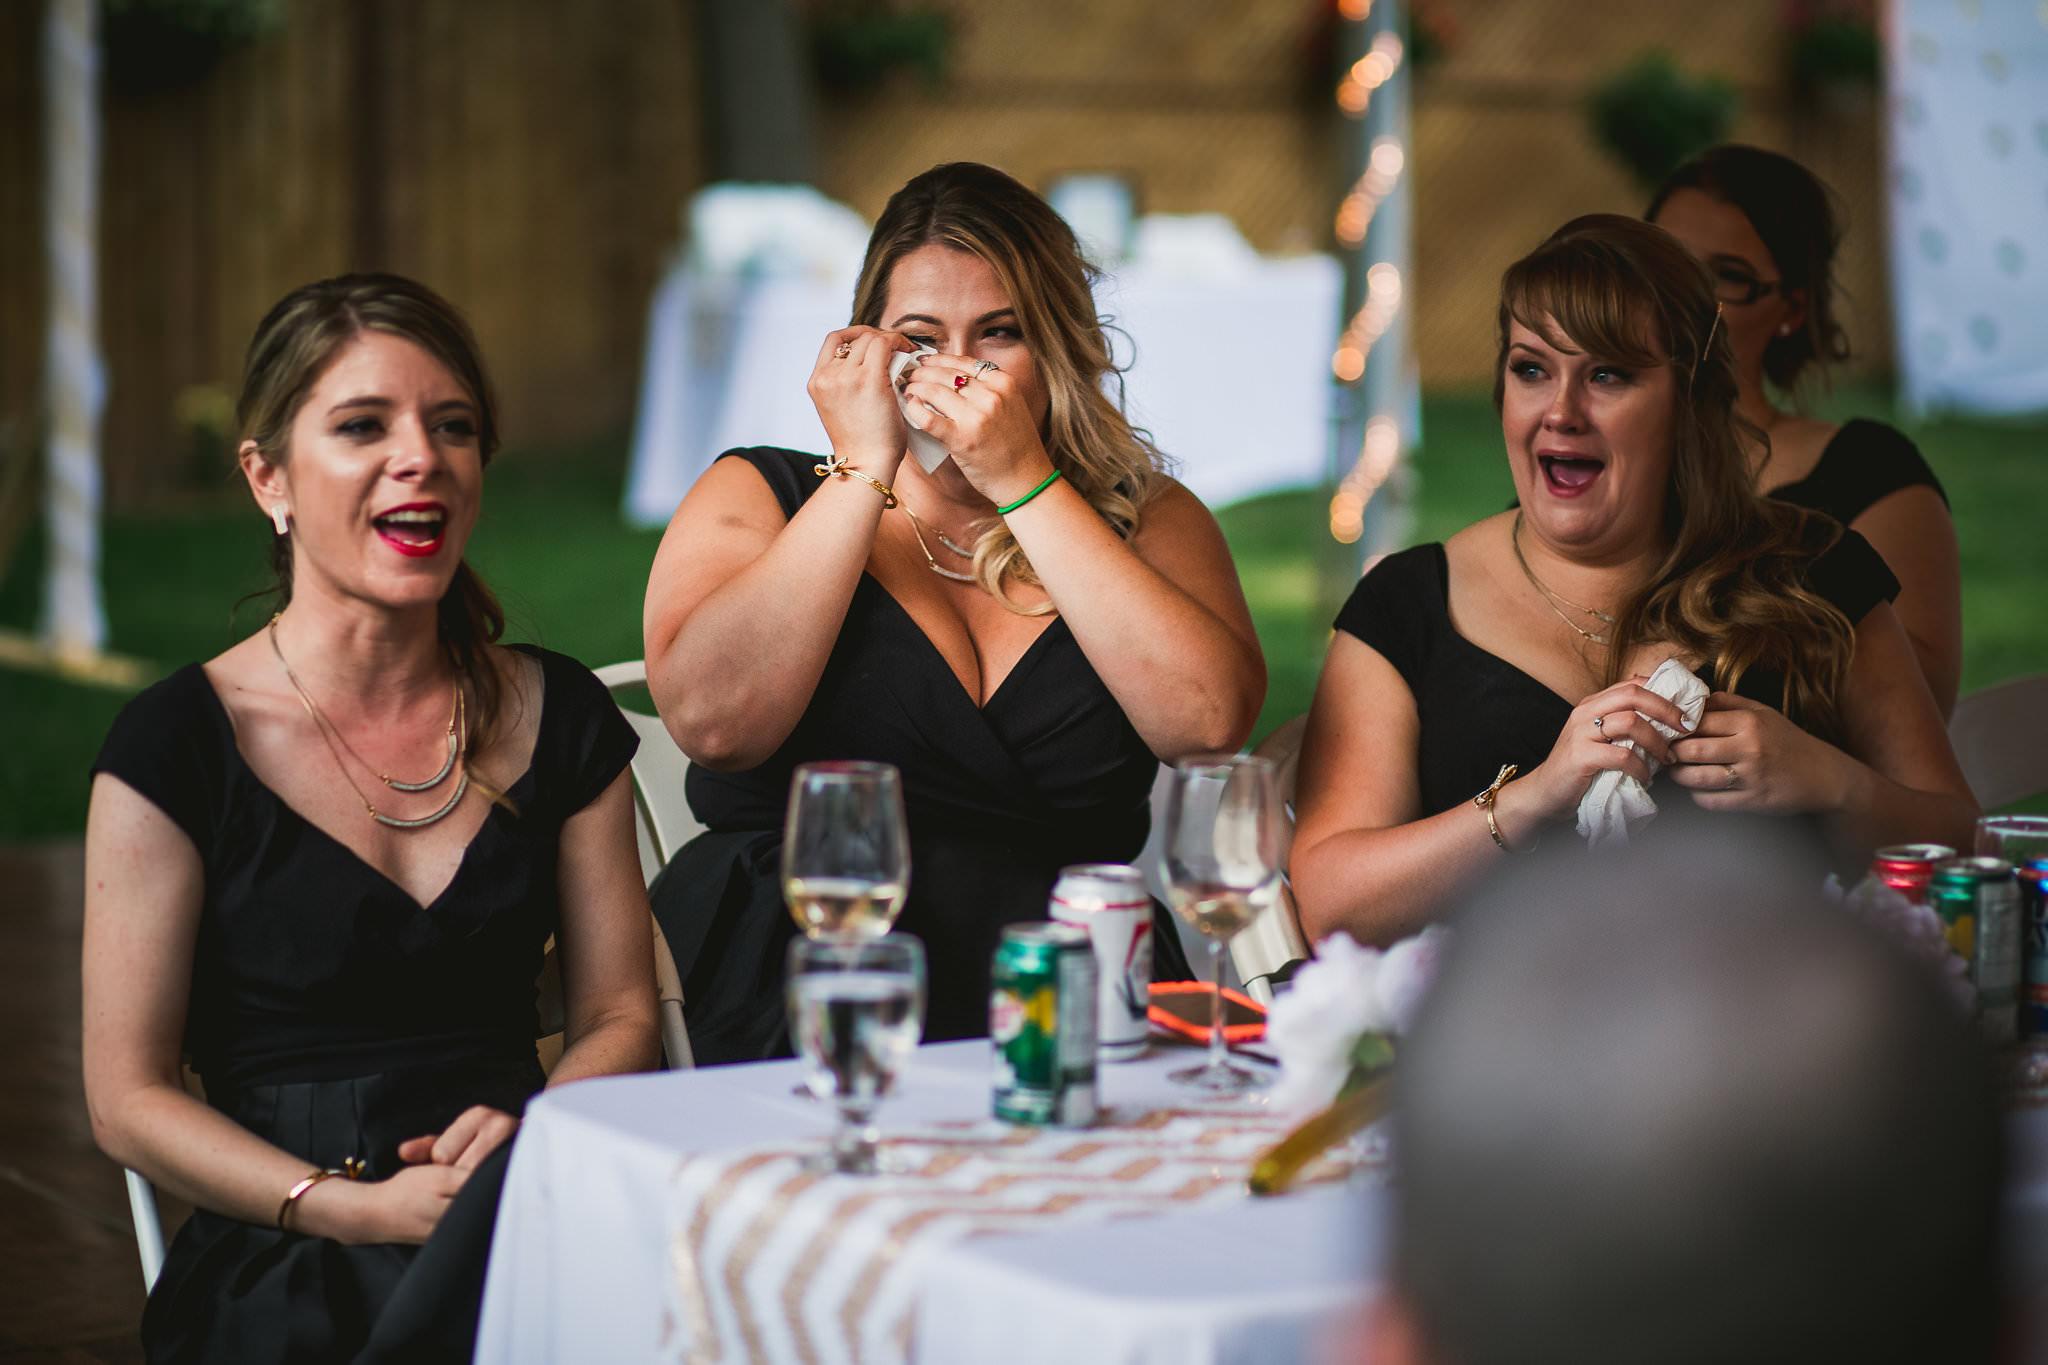 Kristen Adam Kindred Loft Whitby Wedding Photos 533 - Durham Wedding Photographer: Kindred Loft Wedding Photos